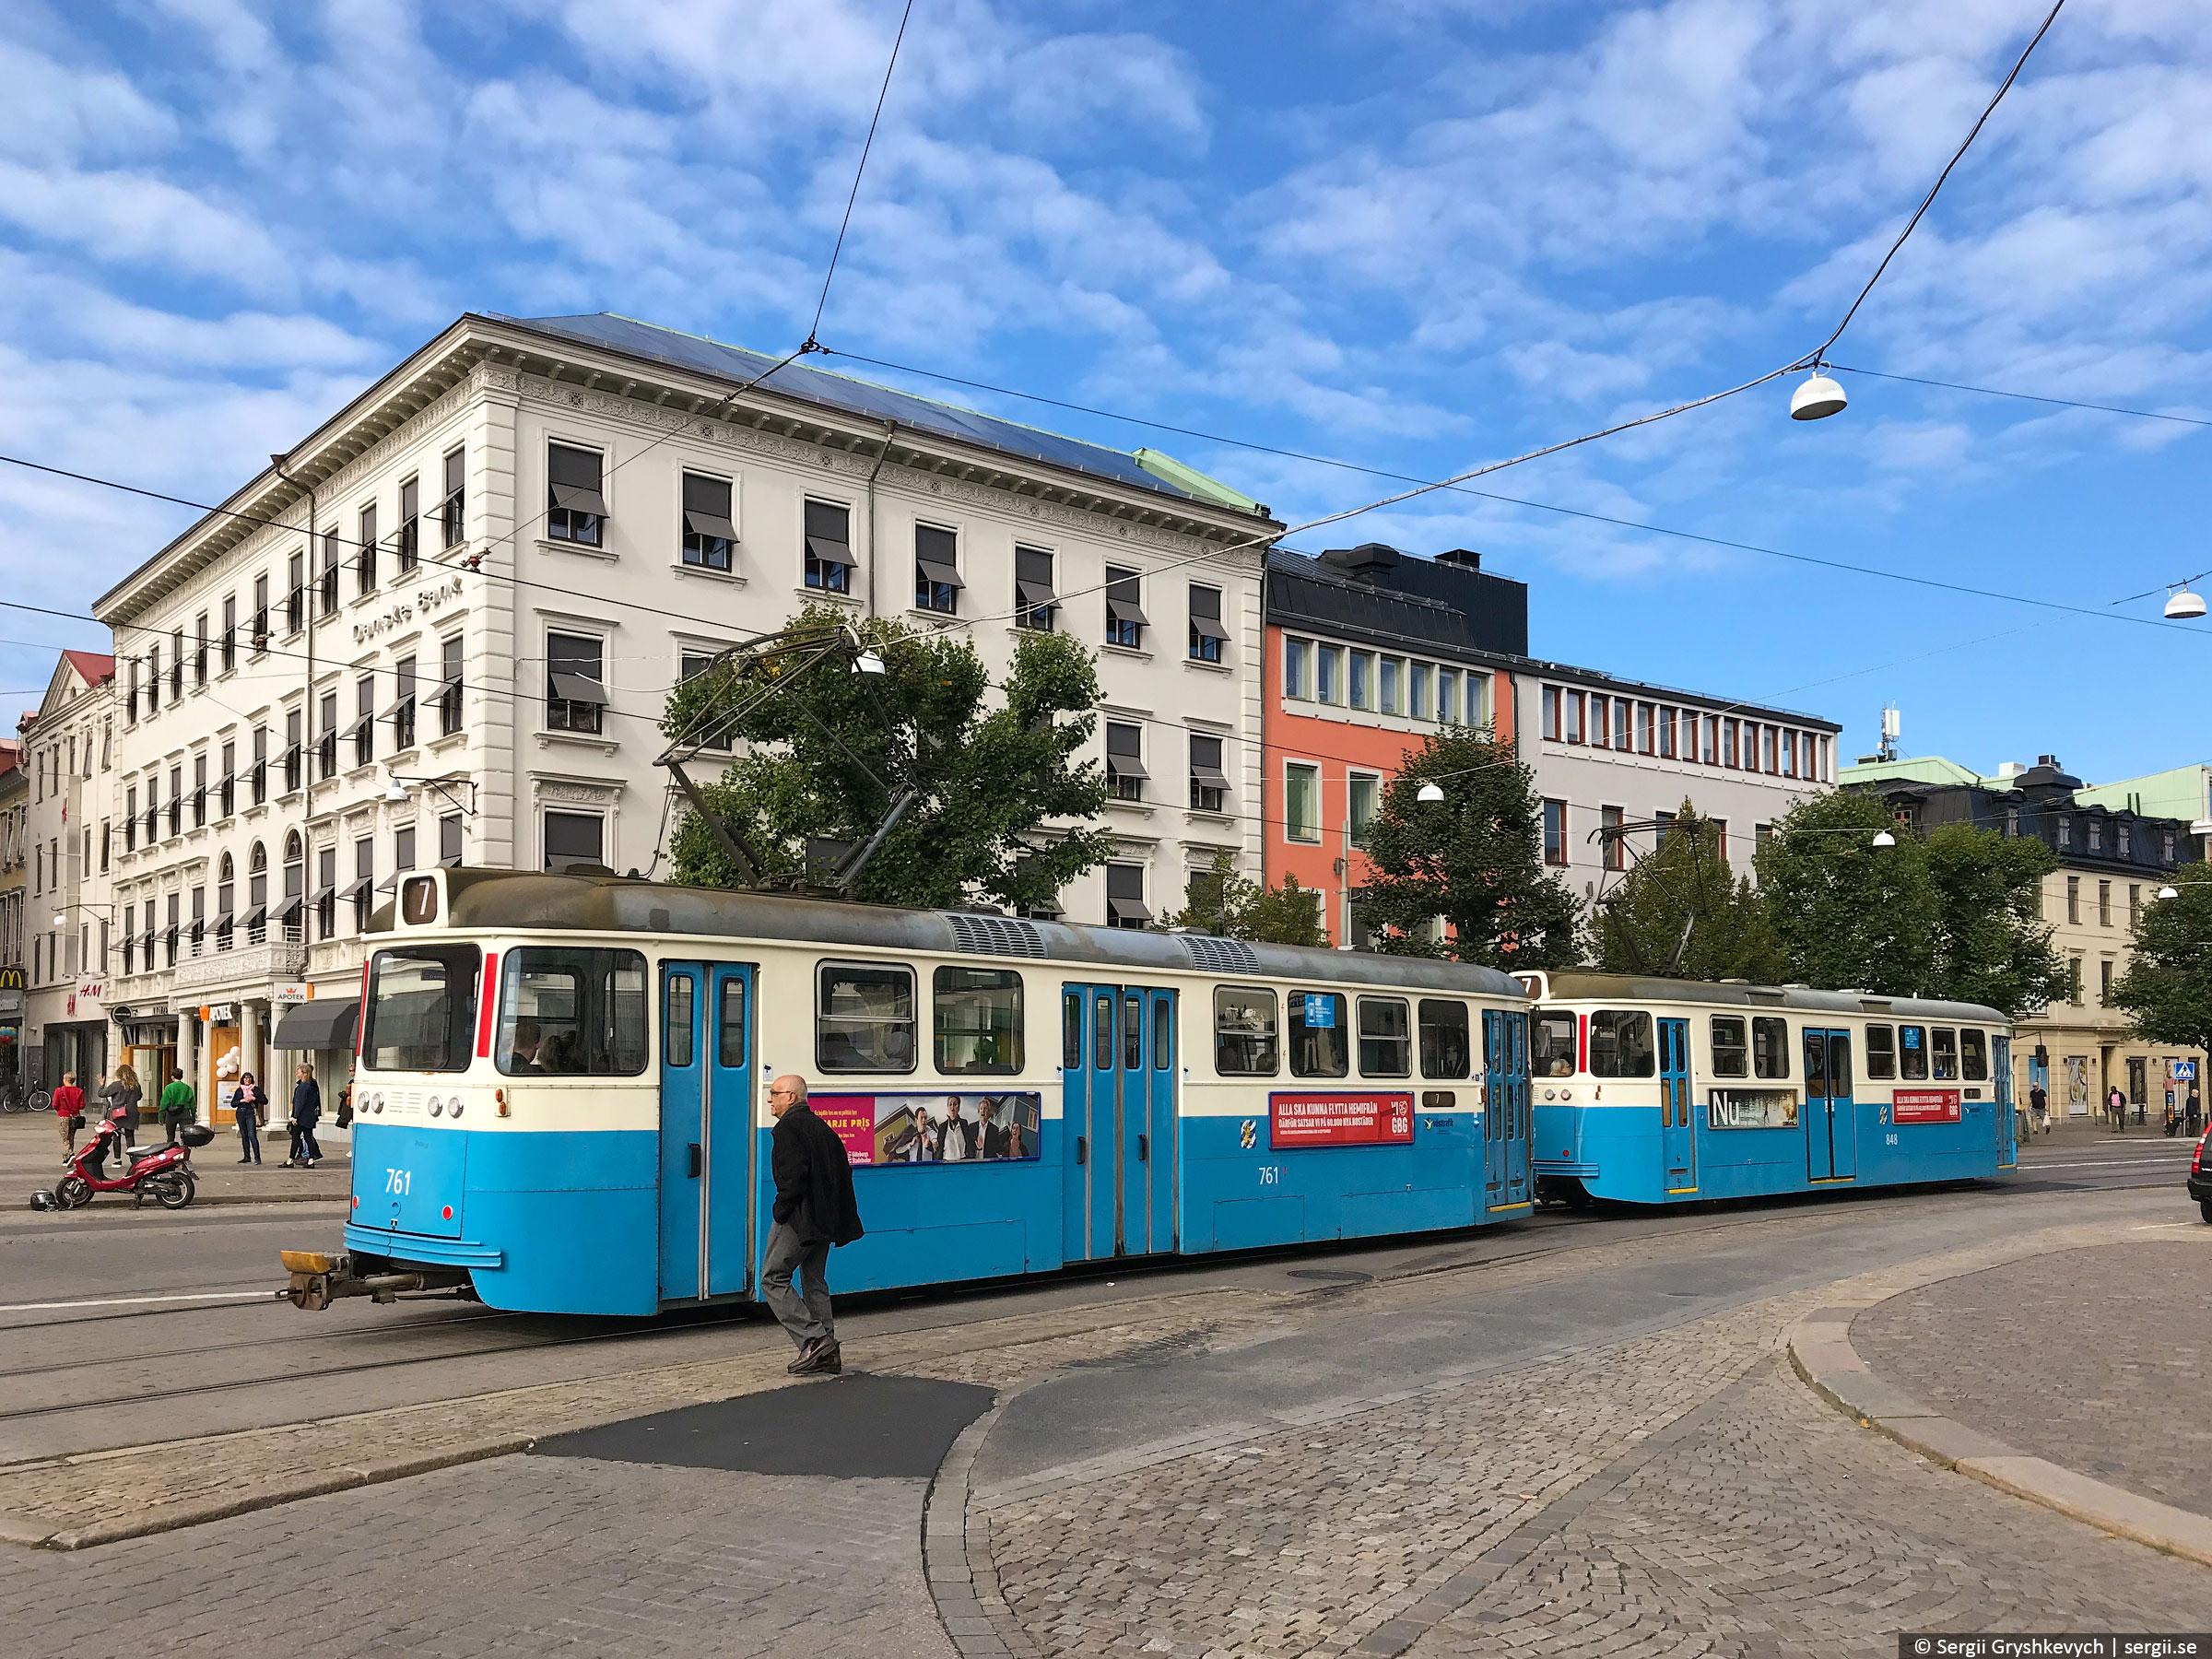 göteborg-ghotenburg-sweden-2018-9